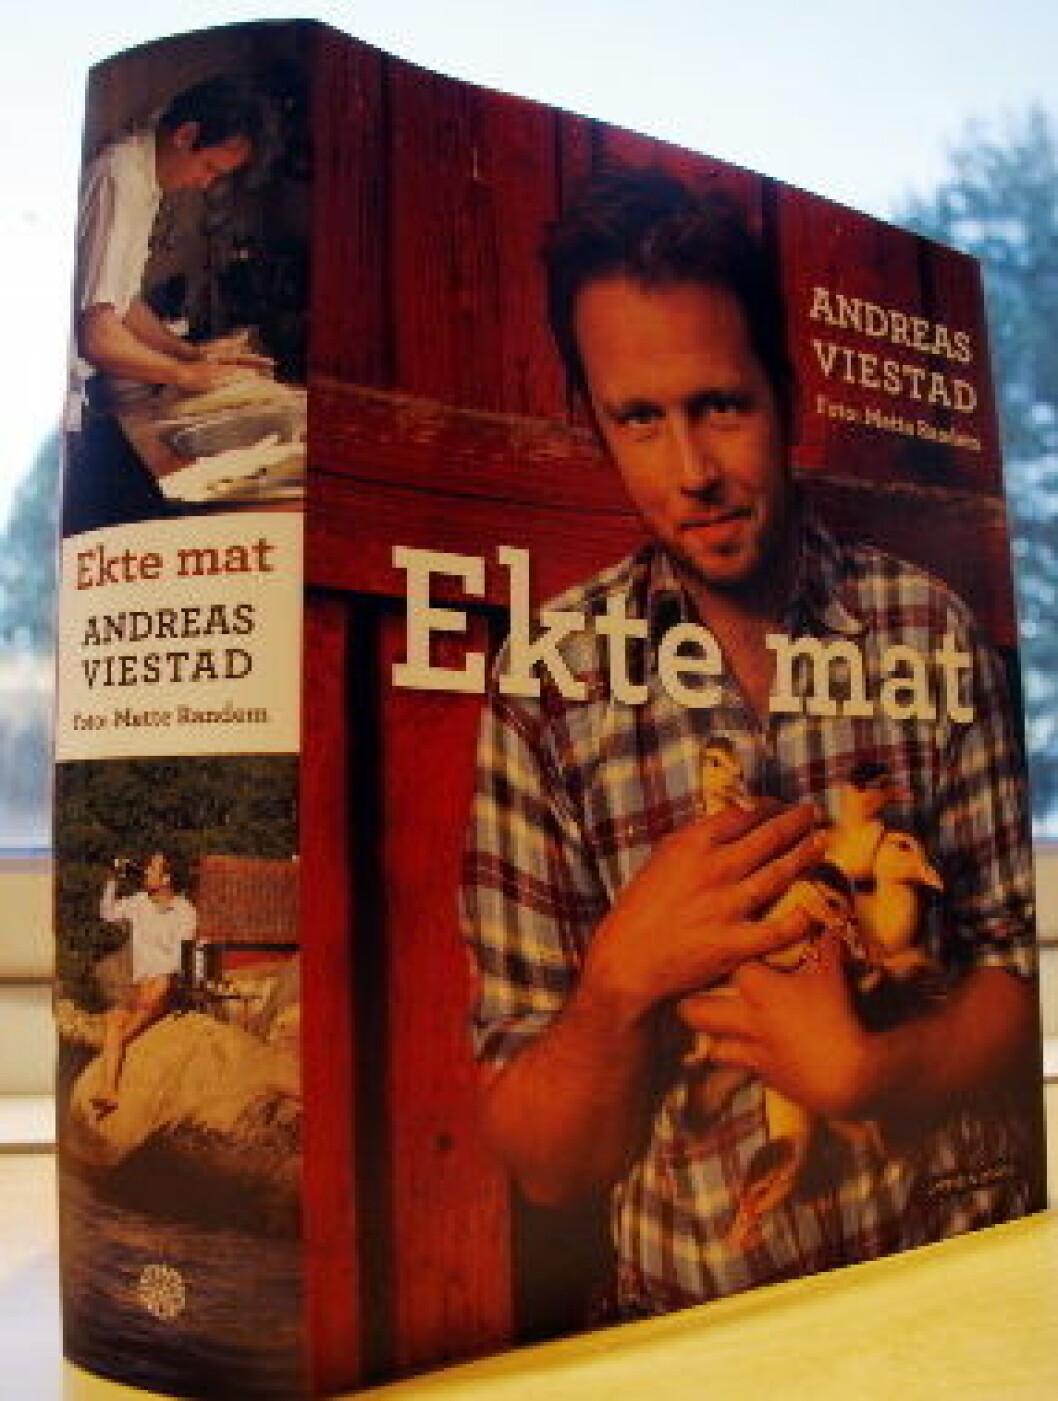 Andreas Viestad Ekte mat (4) NETT